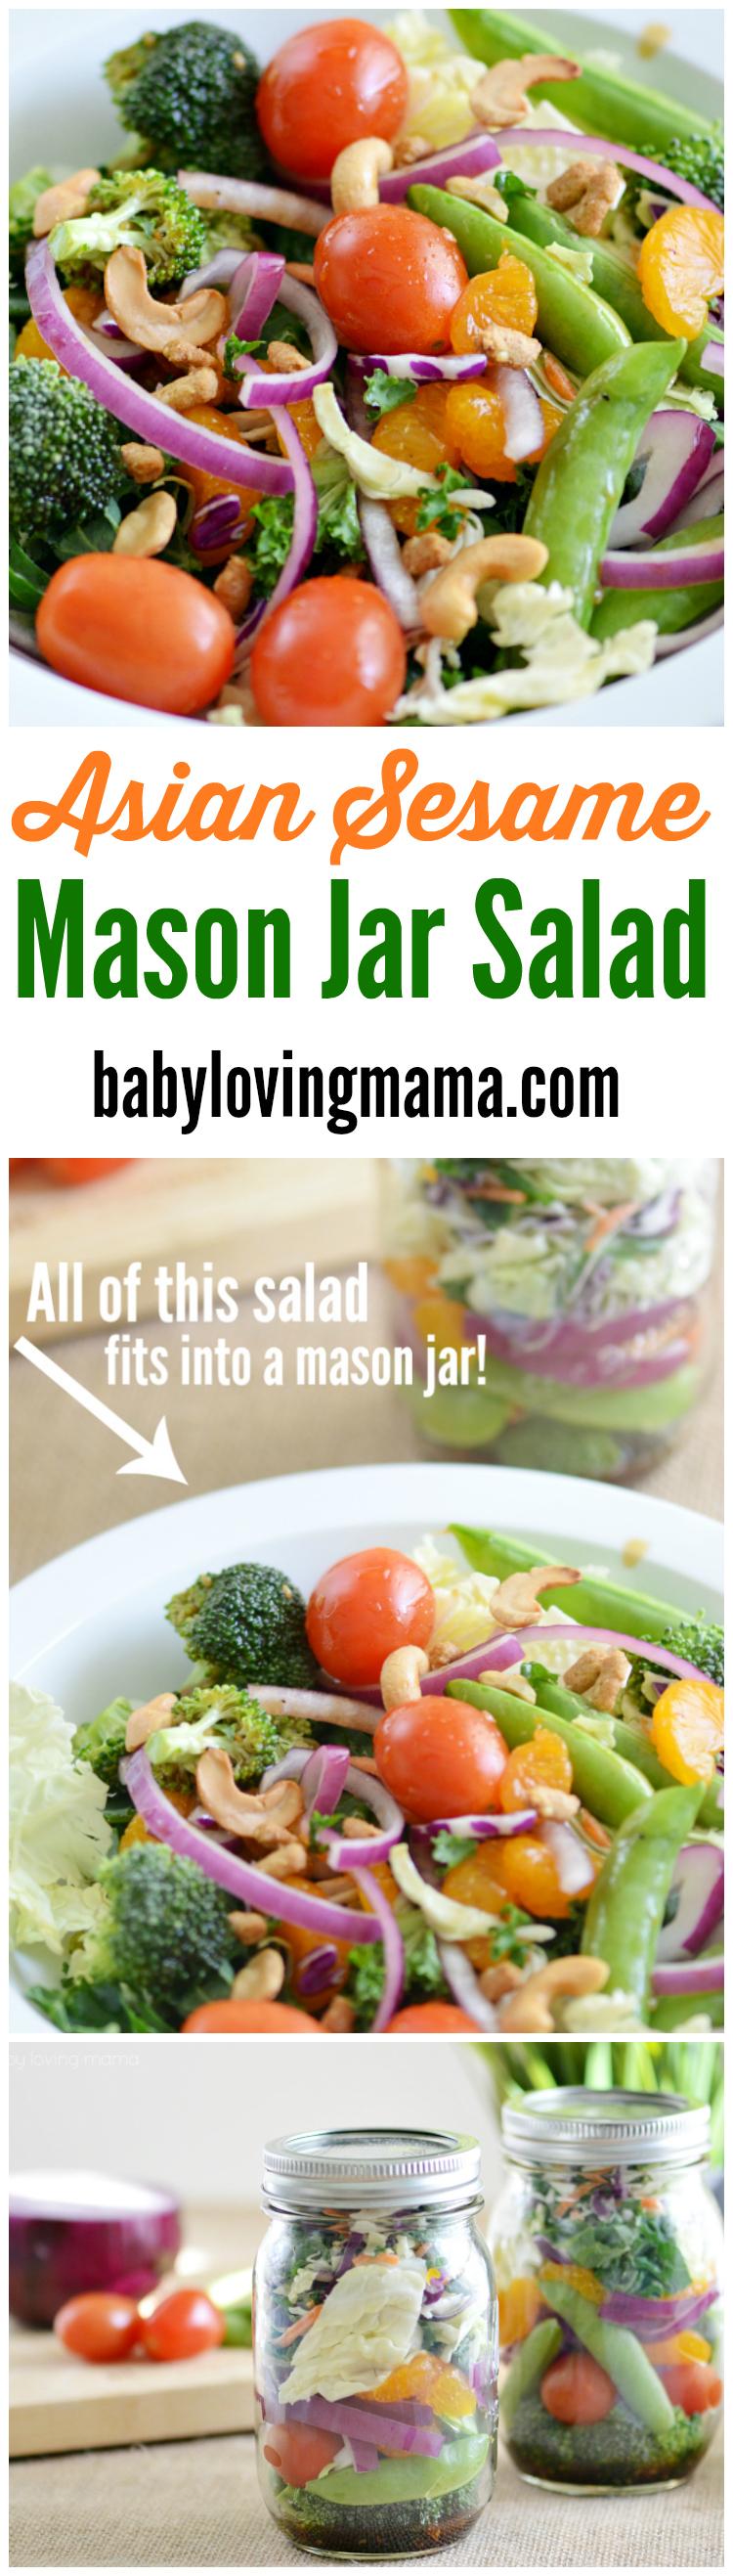 Asian Sesame Mason Jar Salad